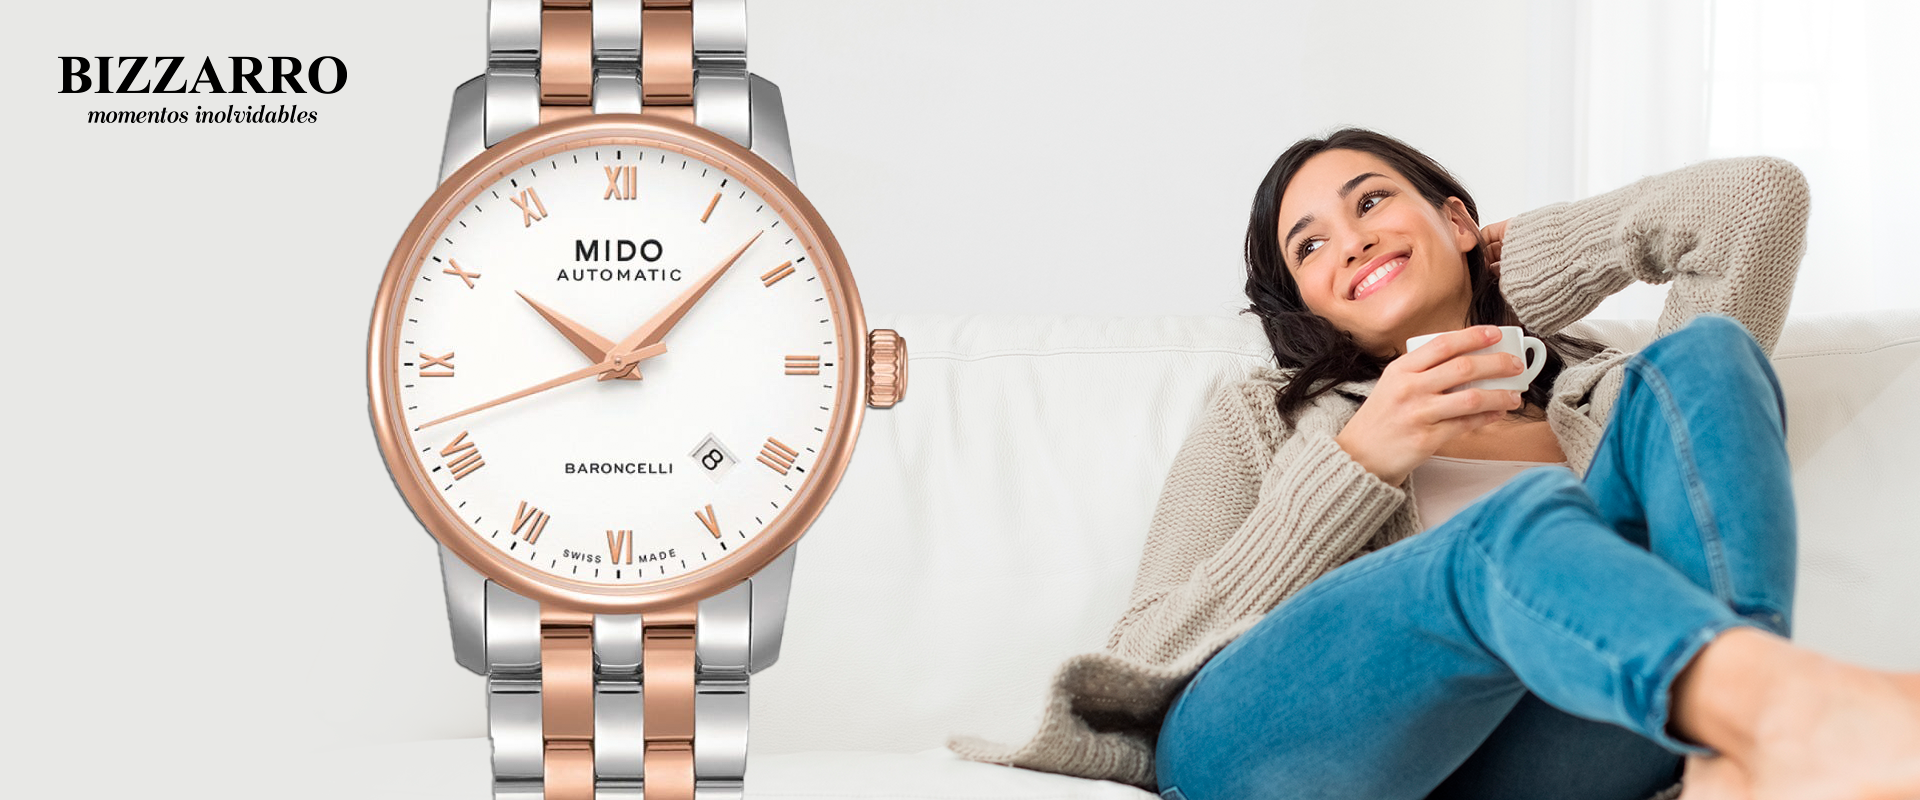 Los relojes ideales para mamá